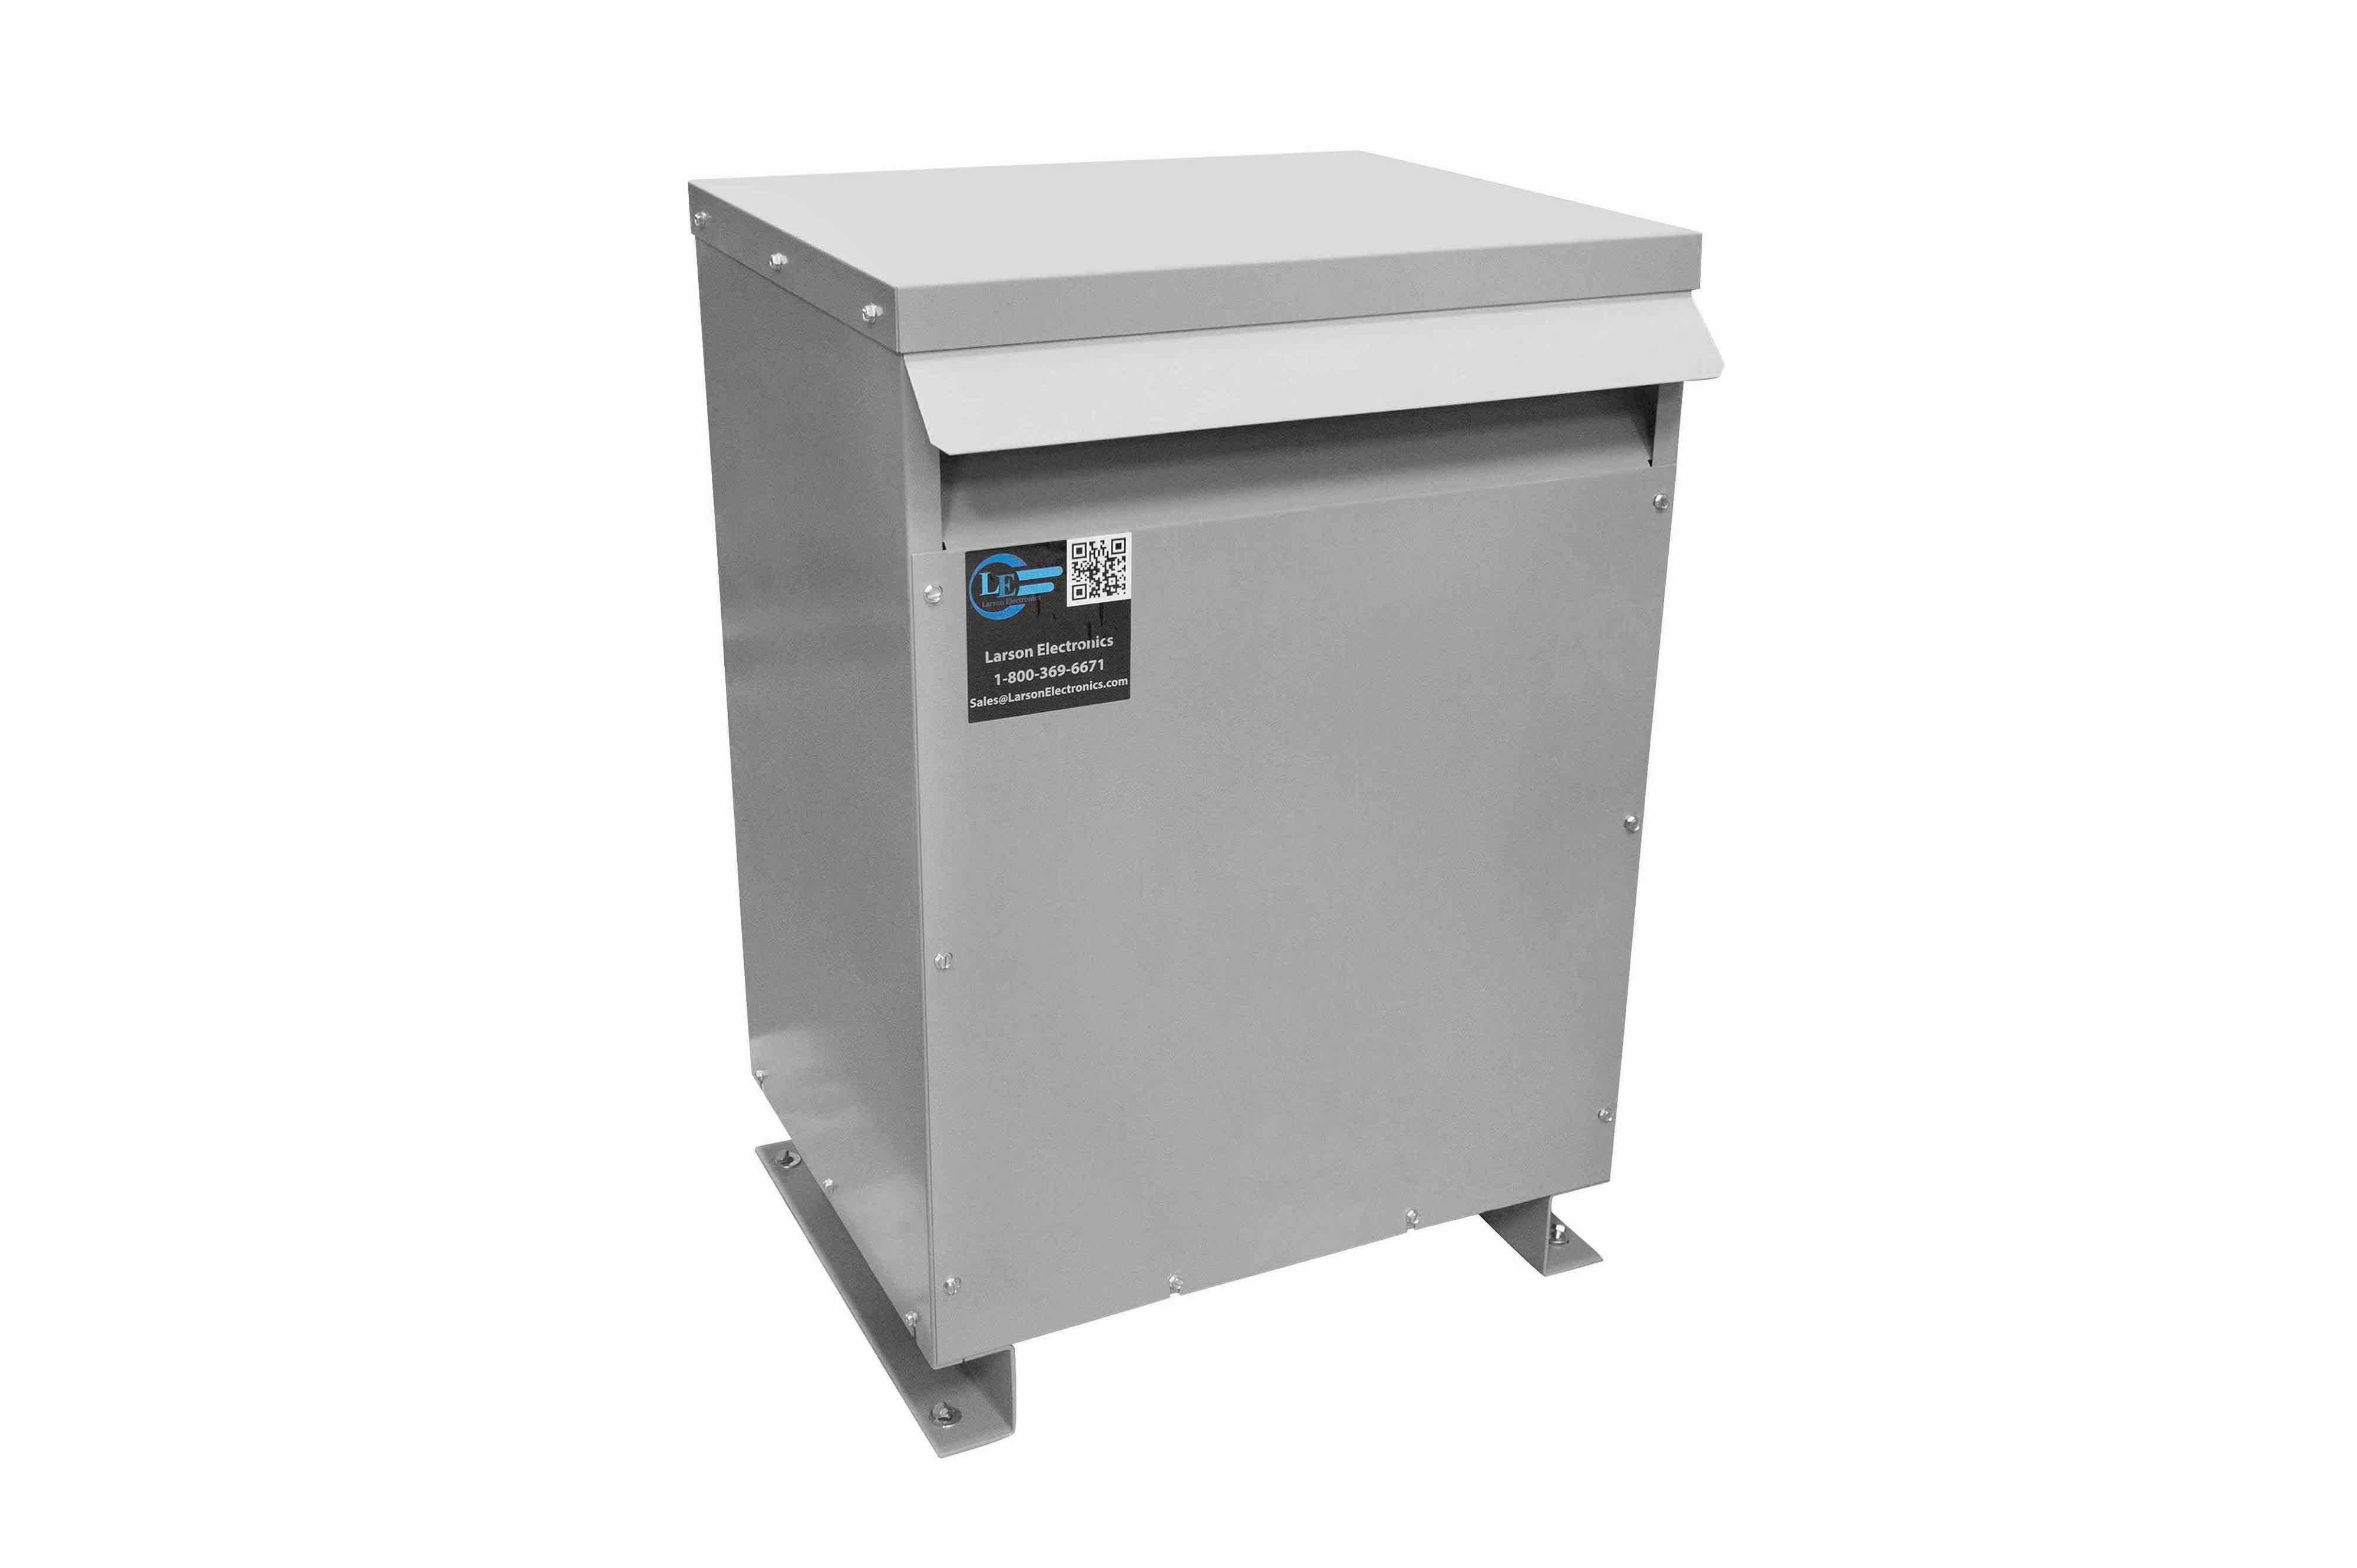 70 kVA 3PH Isolation Transformer, 575V Wye Primary, 380V Delta Secondary, N3R, Ventilated, 60 Hz